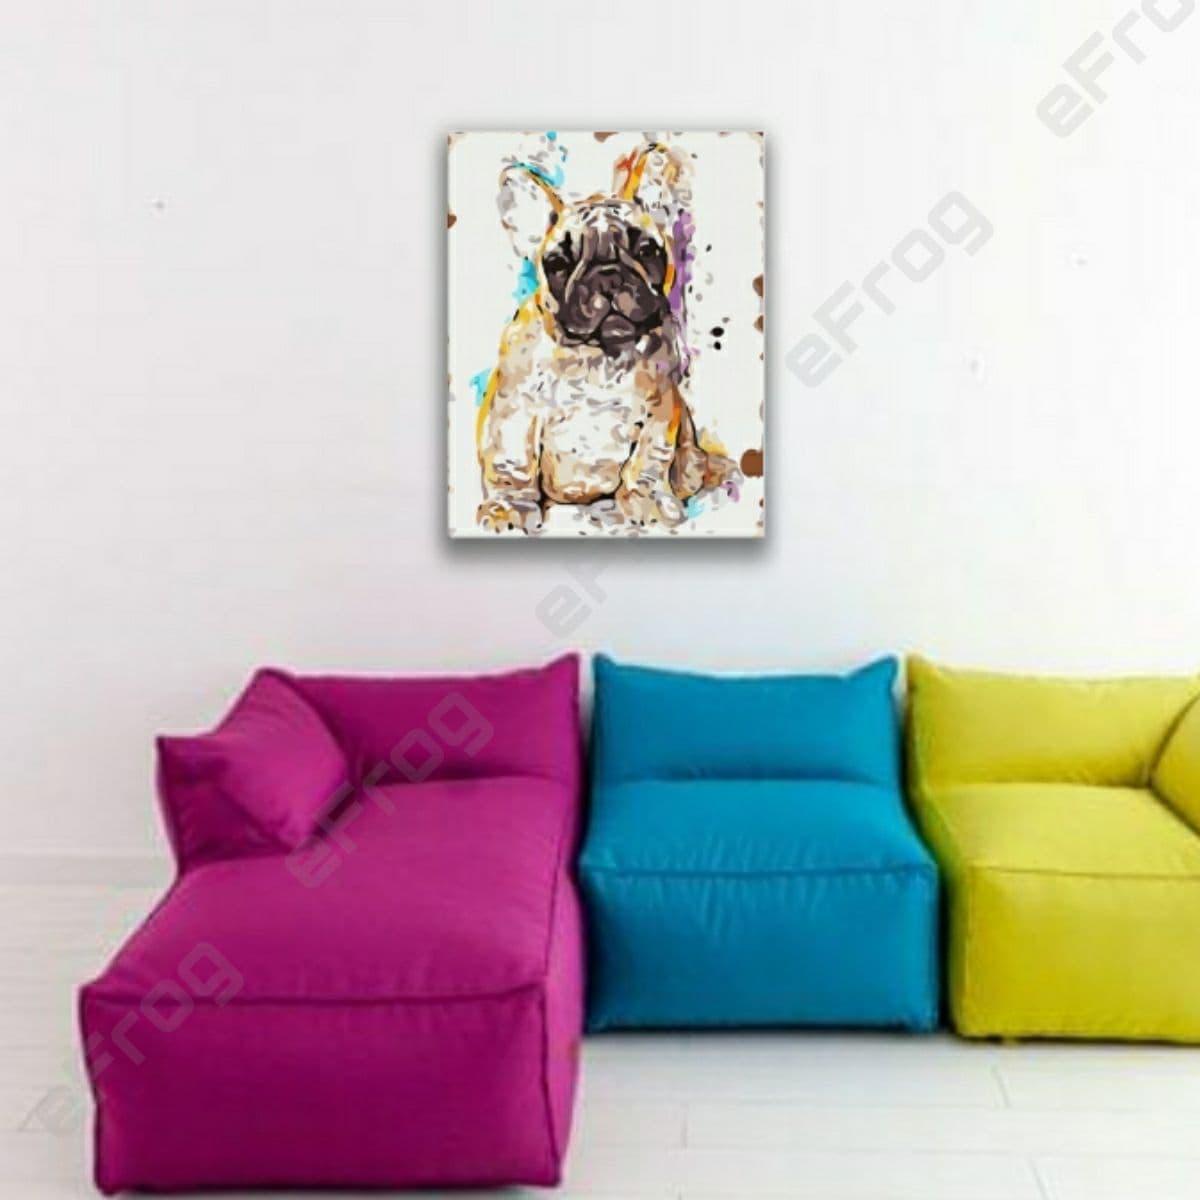 The Dog1 1